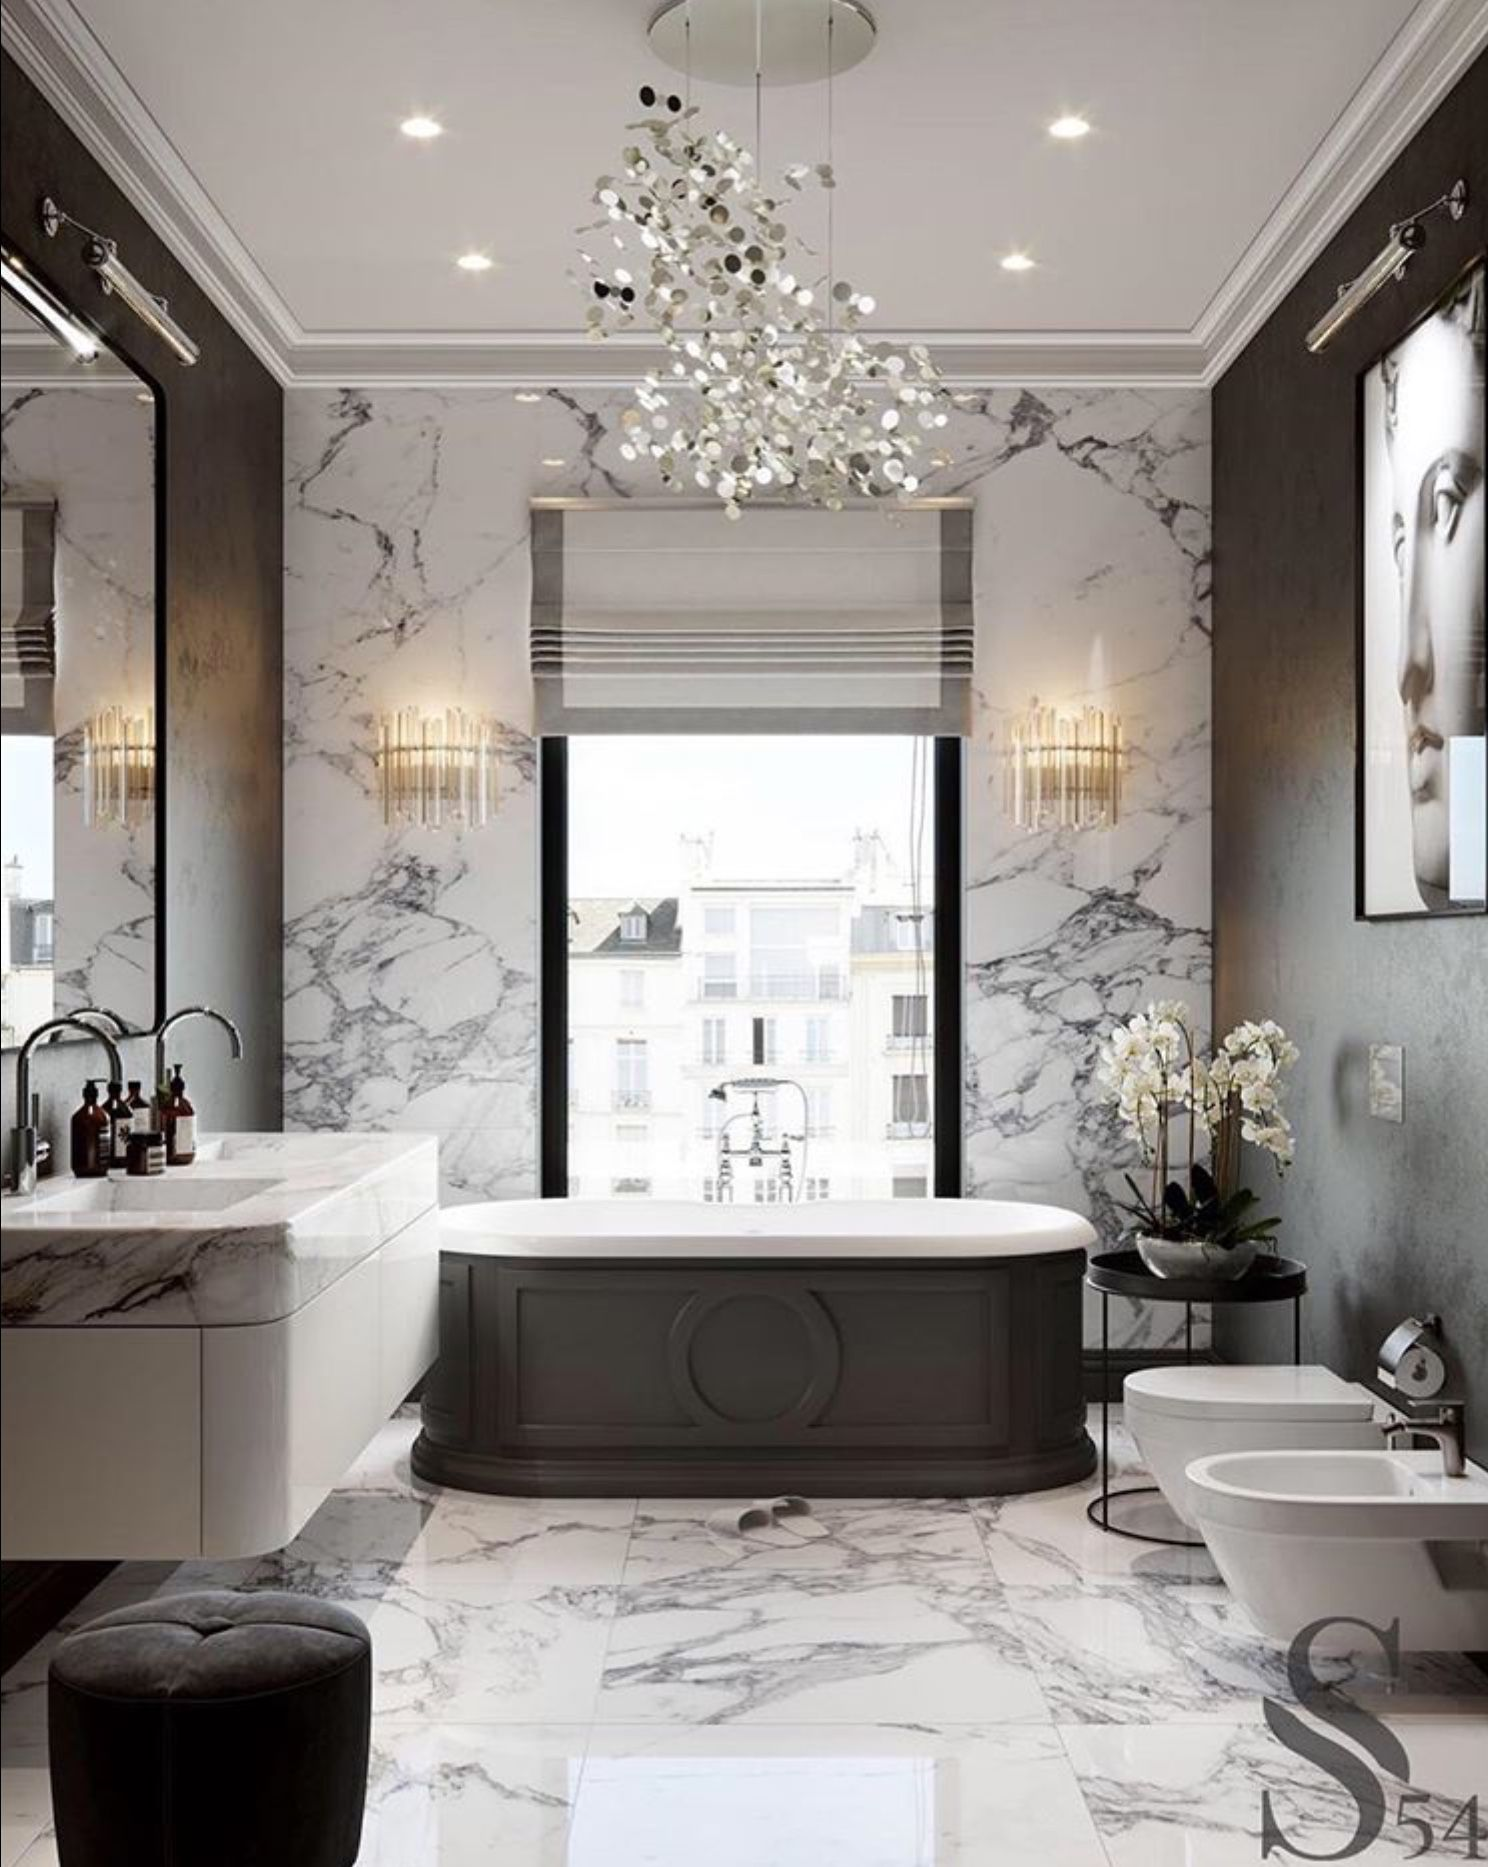 Black White Glam Bathroom Glam Vibe 1 Marble For Wall Floor Countertop 2 Crown Molding 3 Pa Bathroom Design Layout Luxury Bathroom Elegant Bathroom